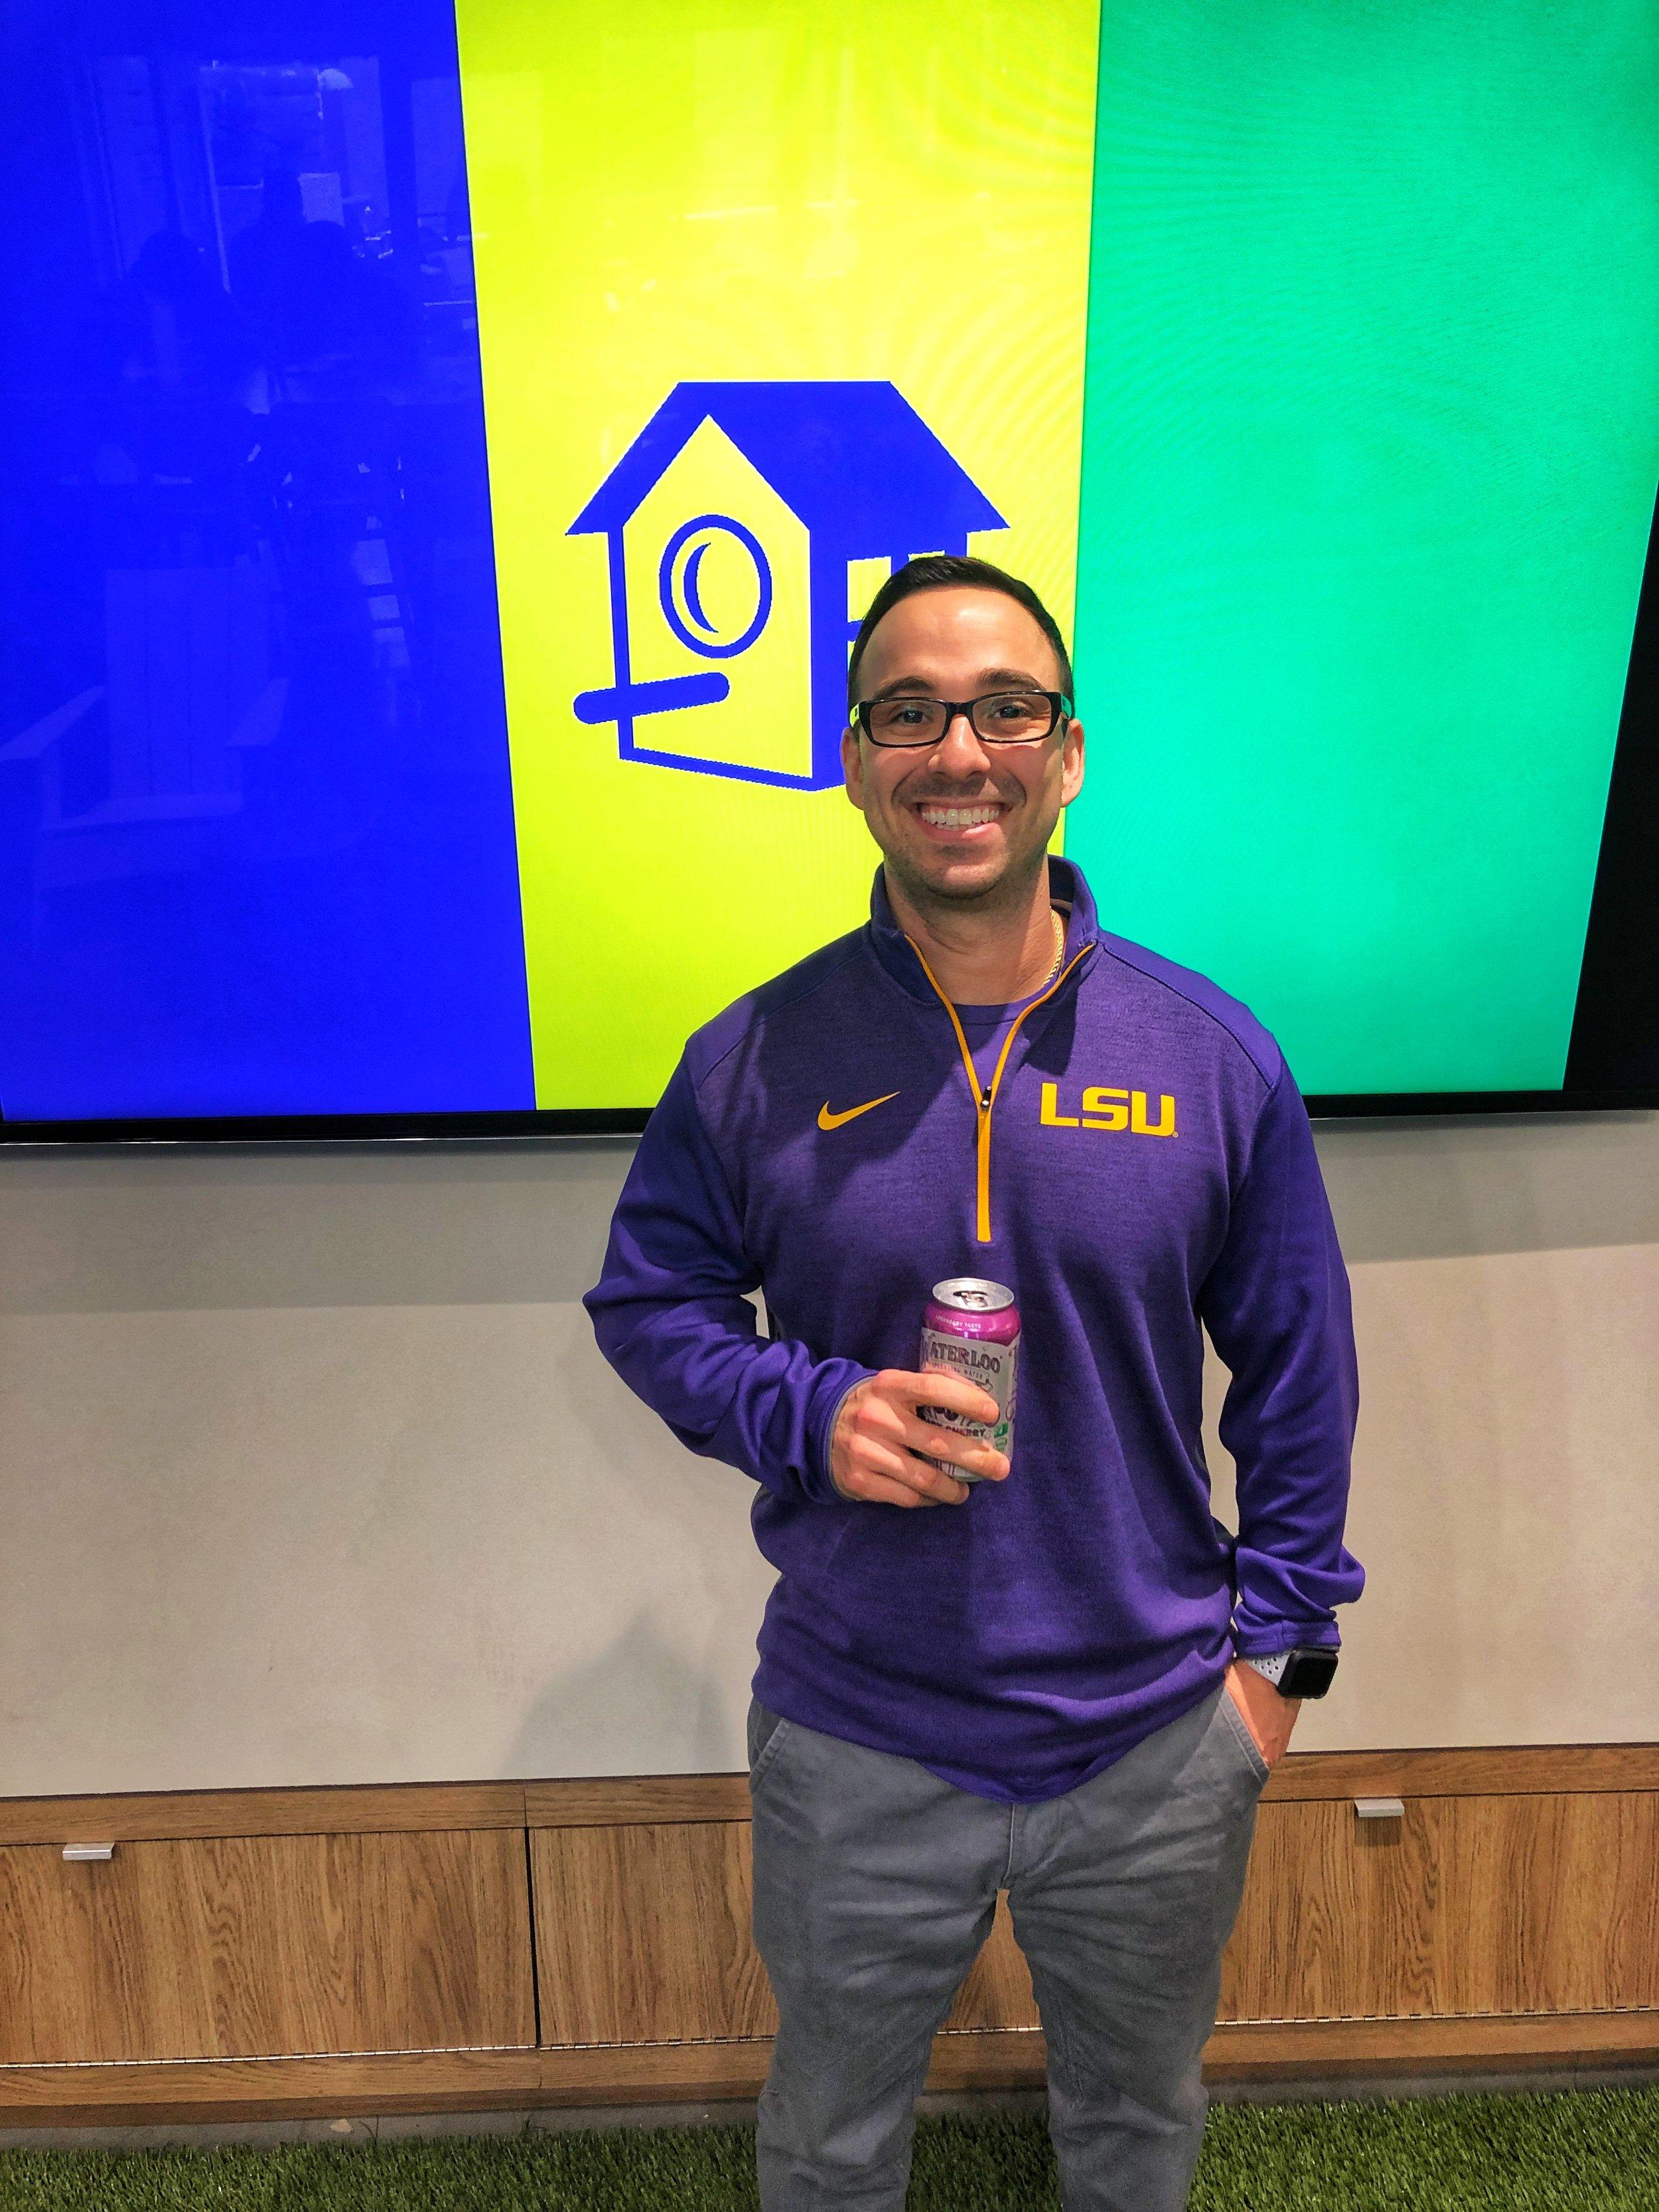 Matt Carboni representing his alma mater, Louisiana State University.